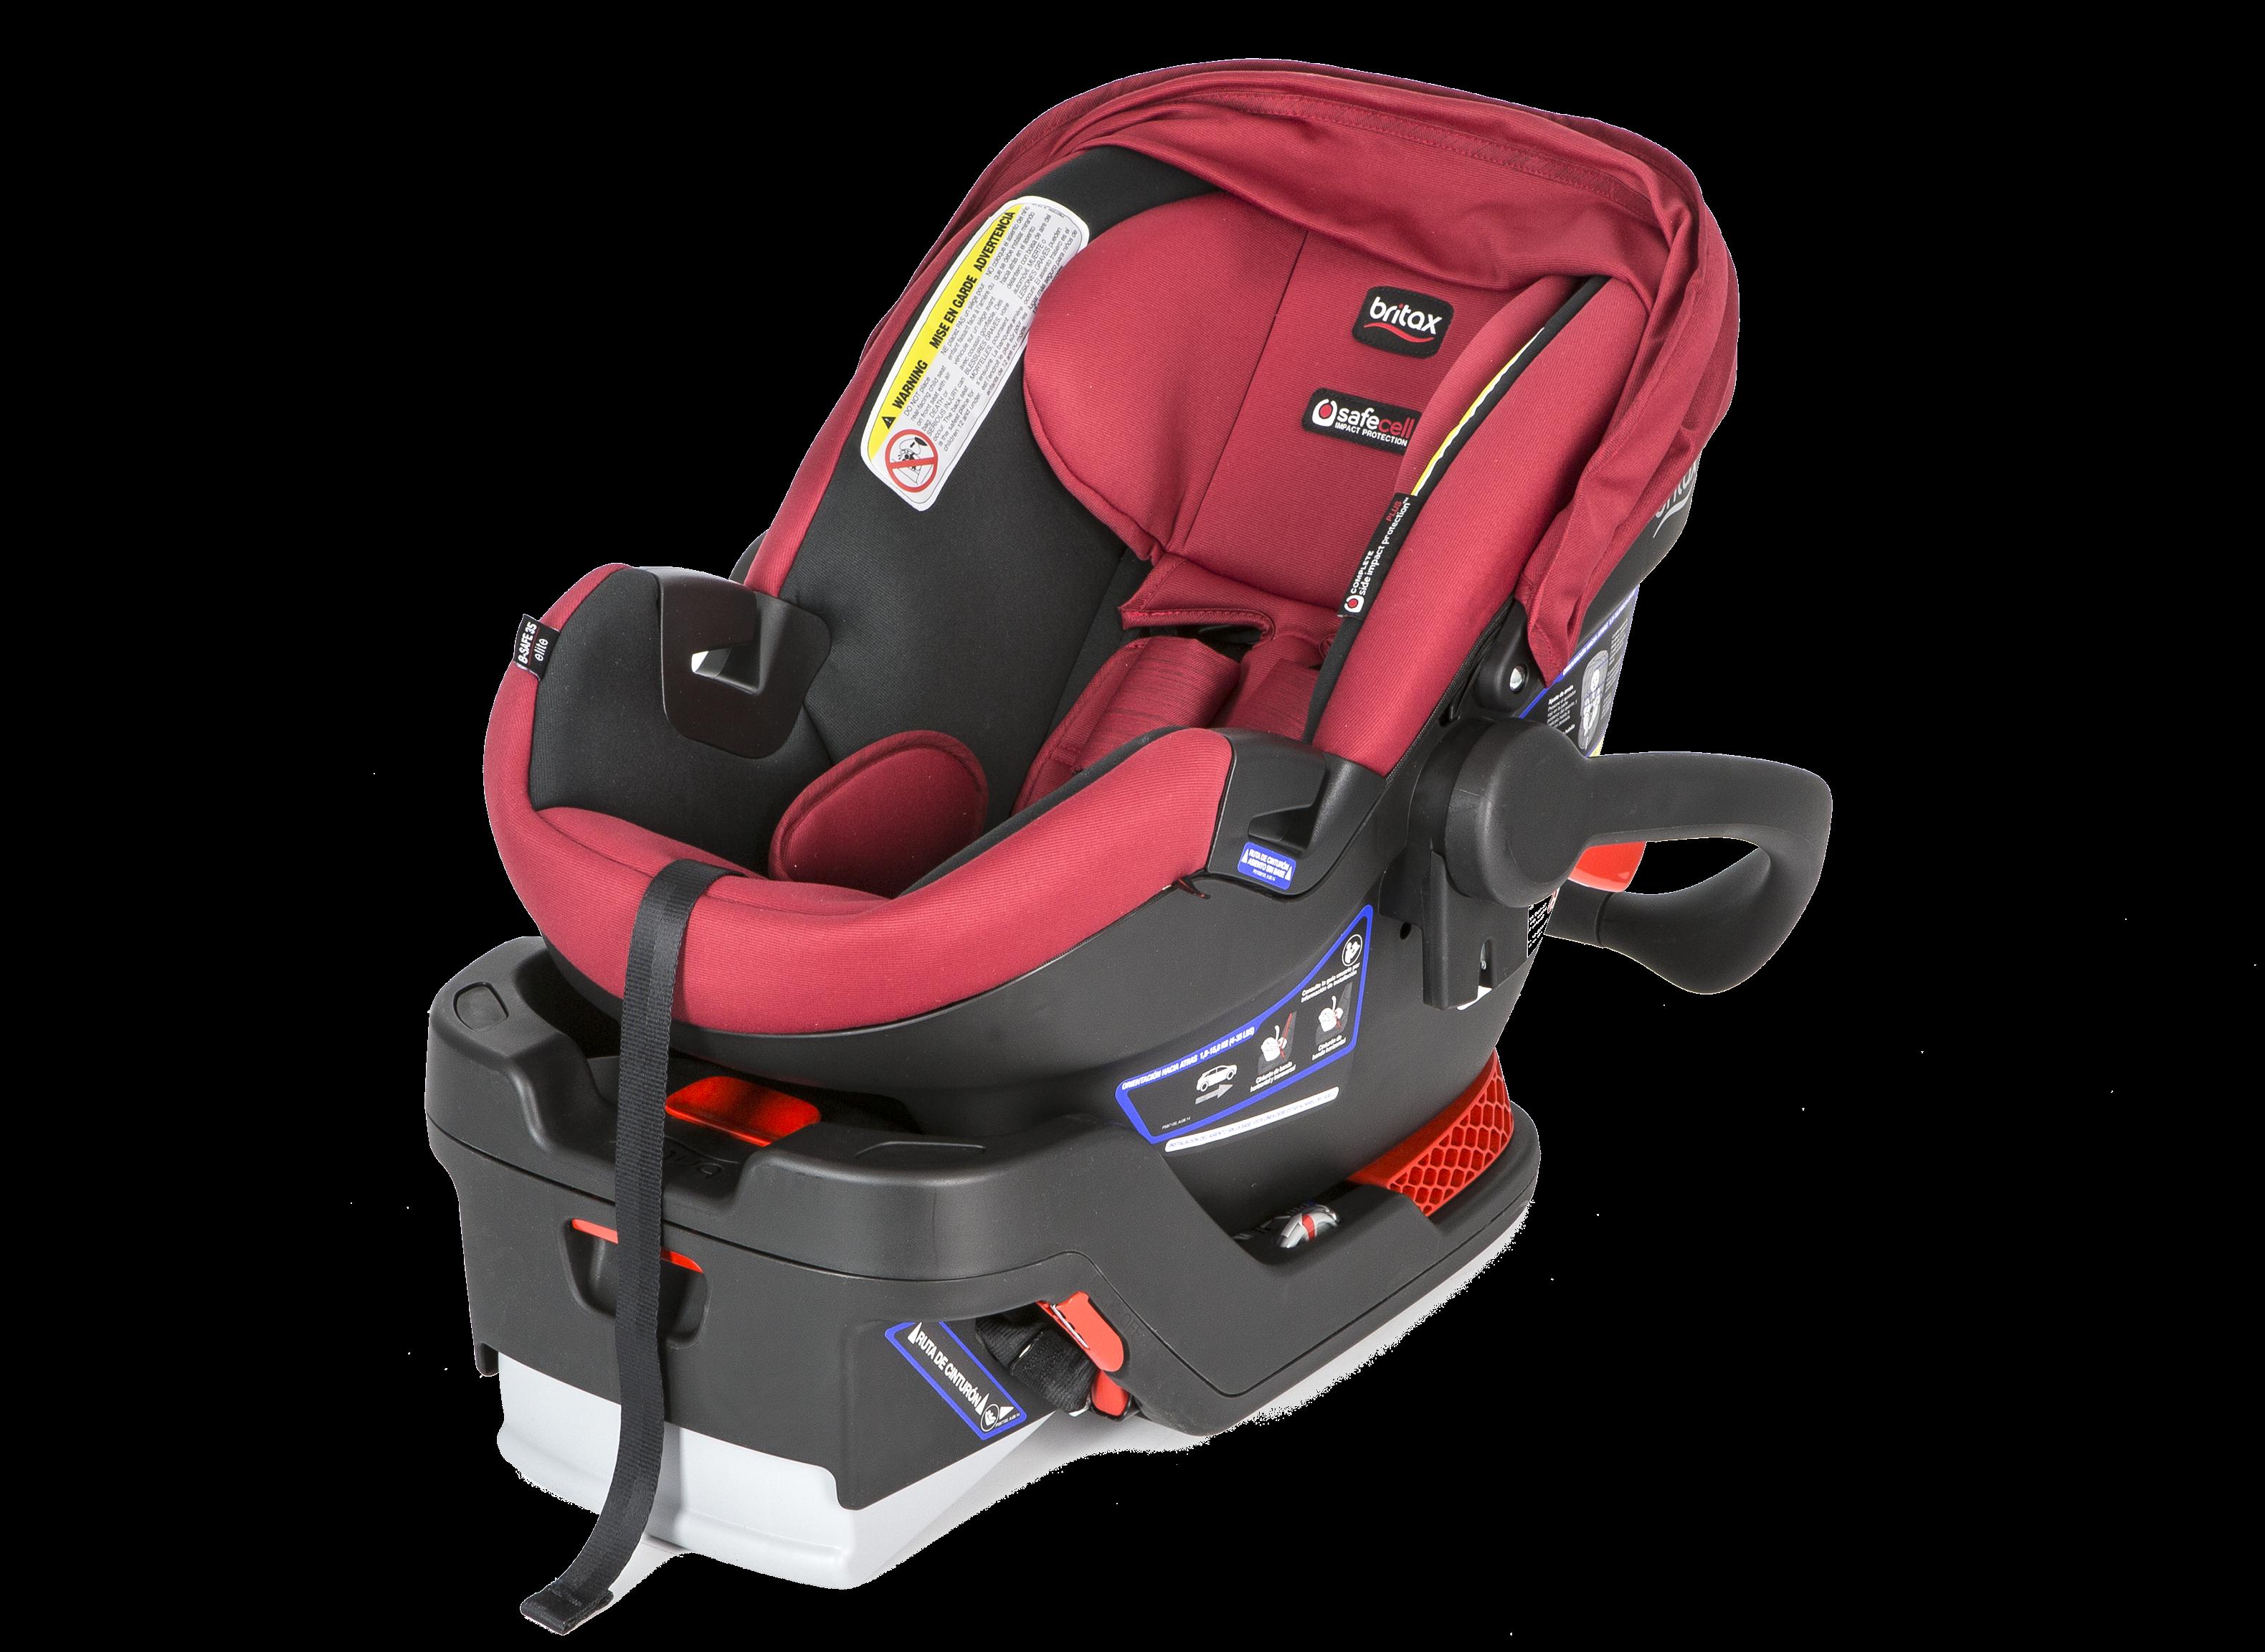 Britax B Safe 35 Elite Car Seat, Britax B Safe 35 Infant Car Seat Adjustment